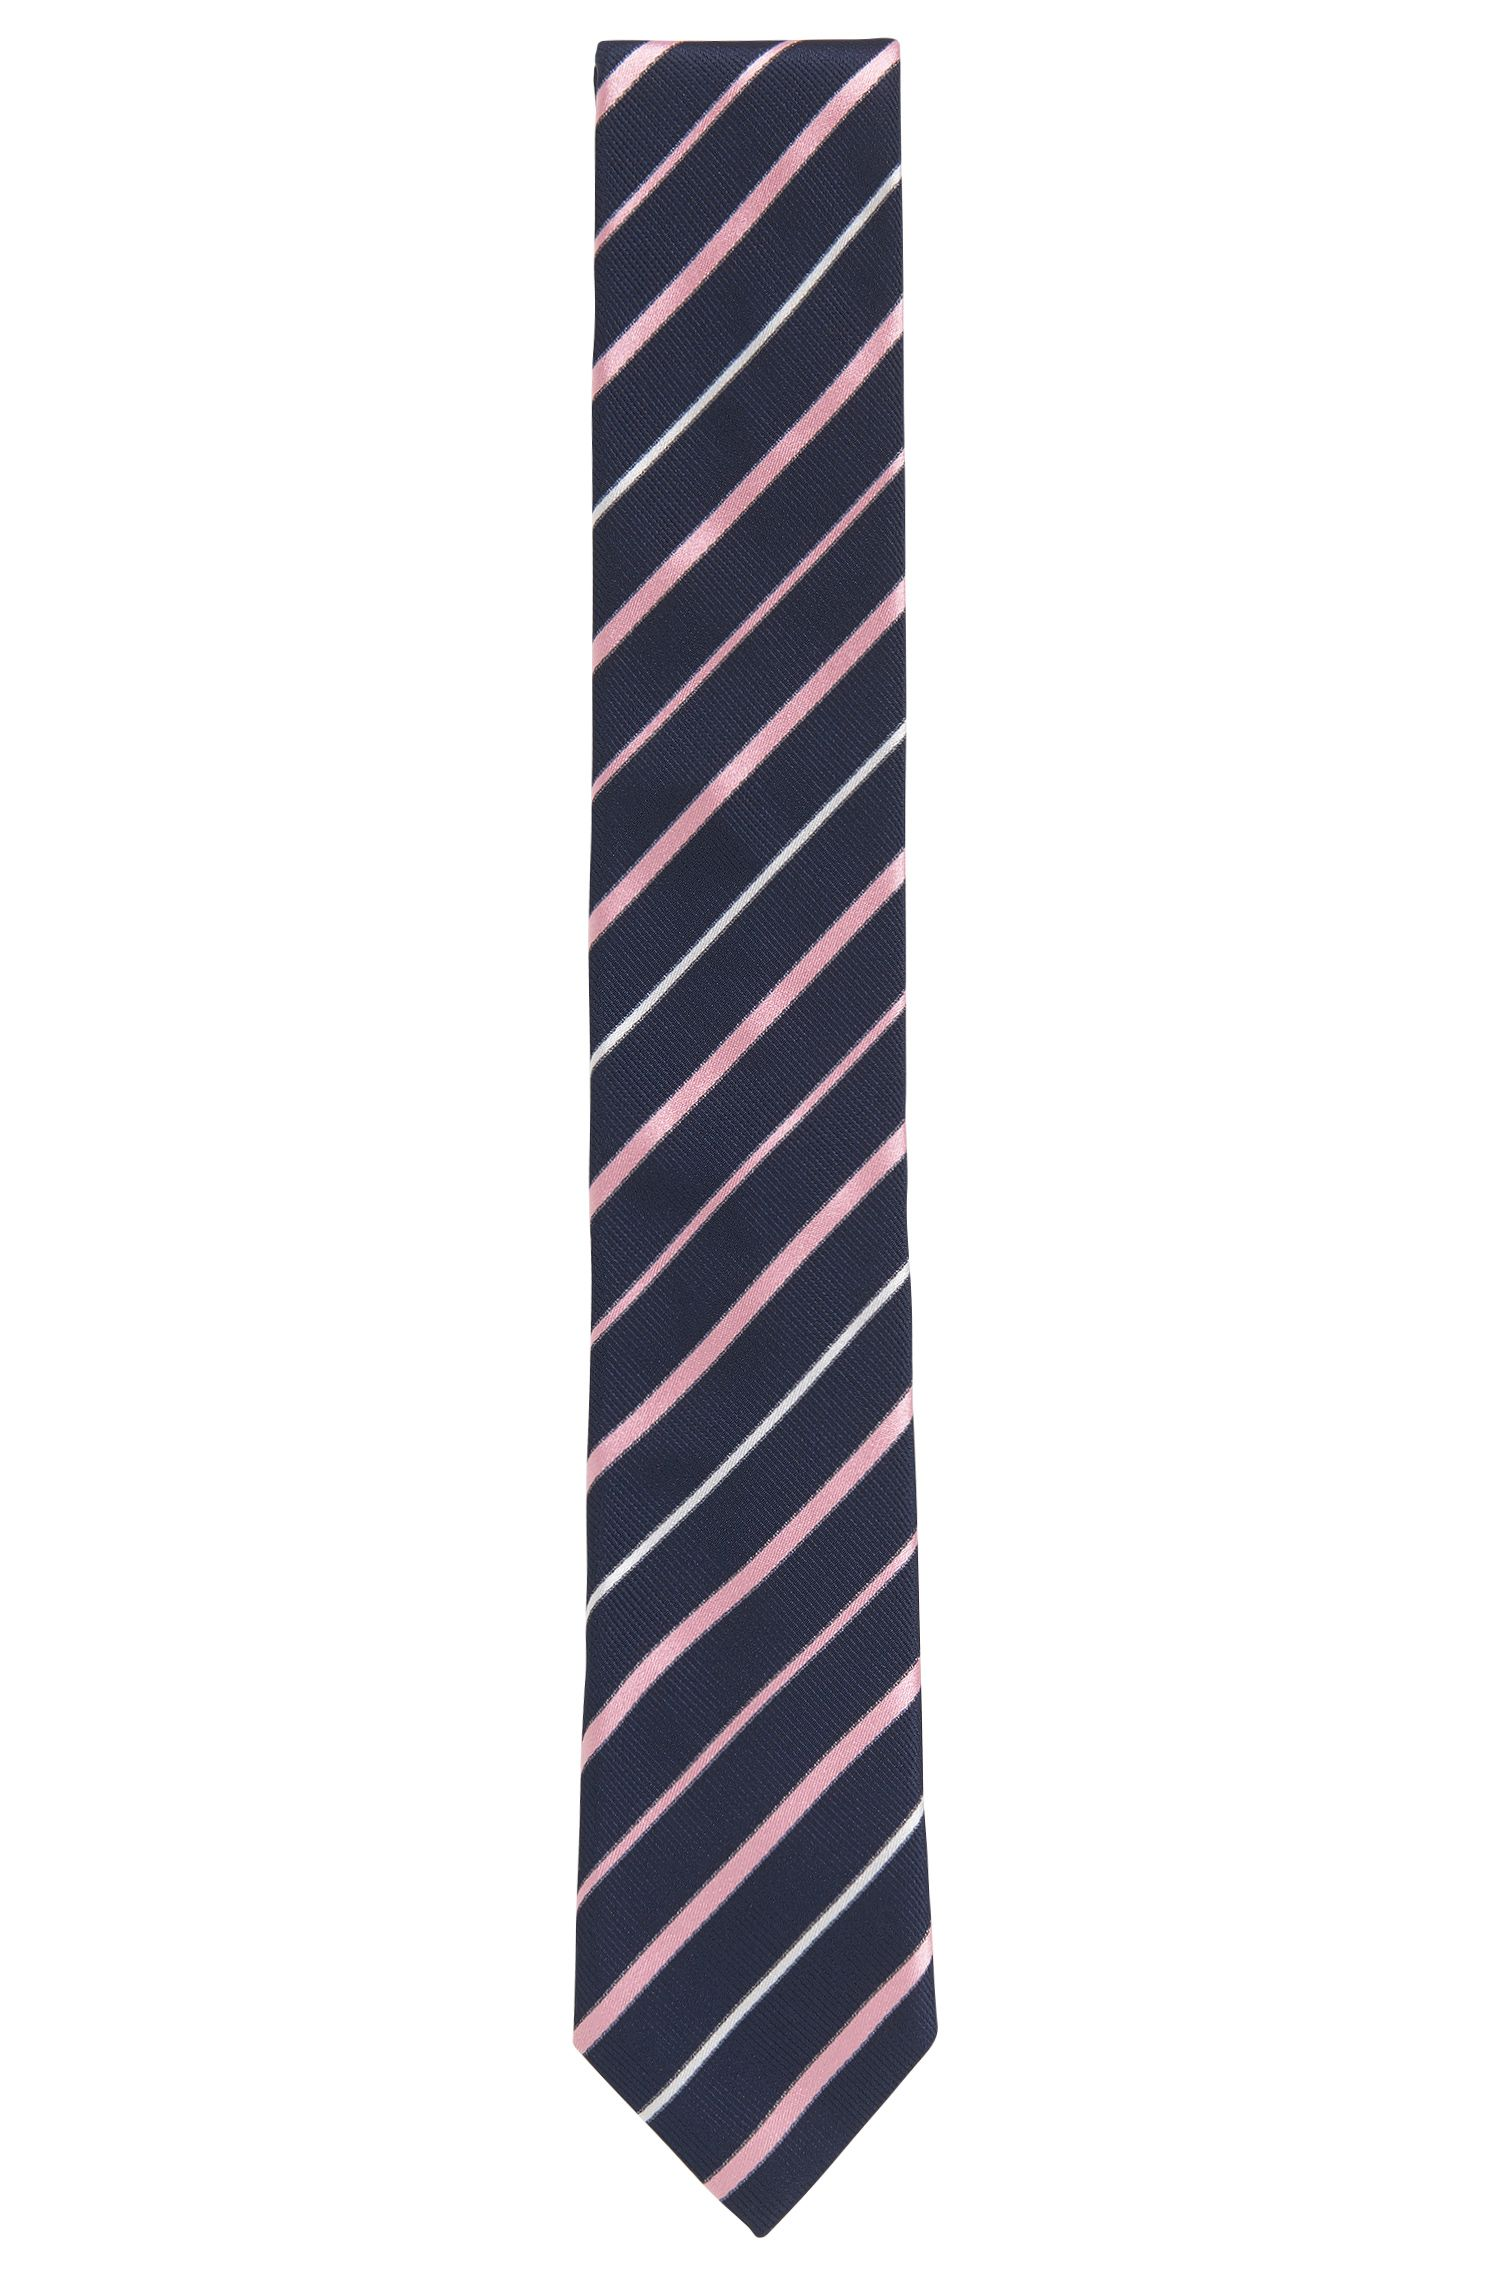 Striped Italian Silk Repp Slim Tie, light pink